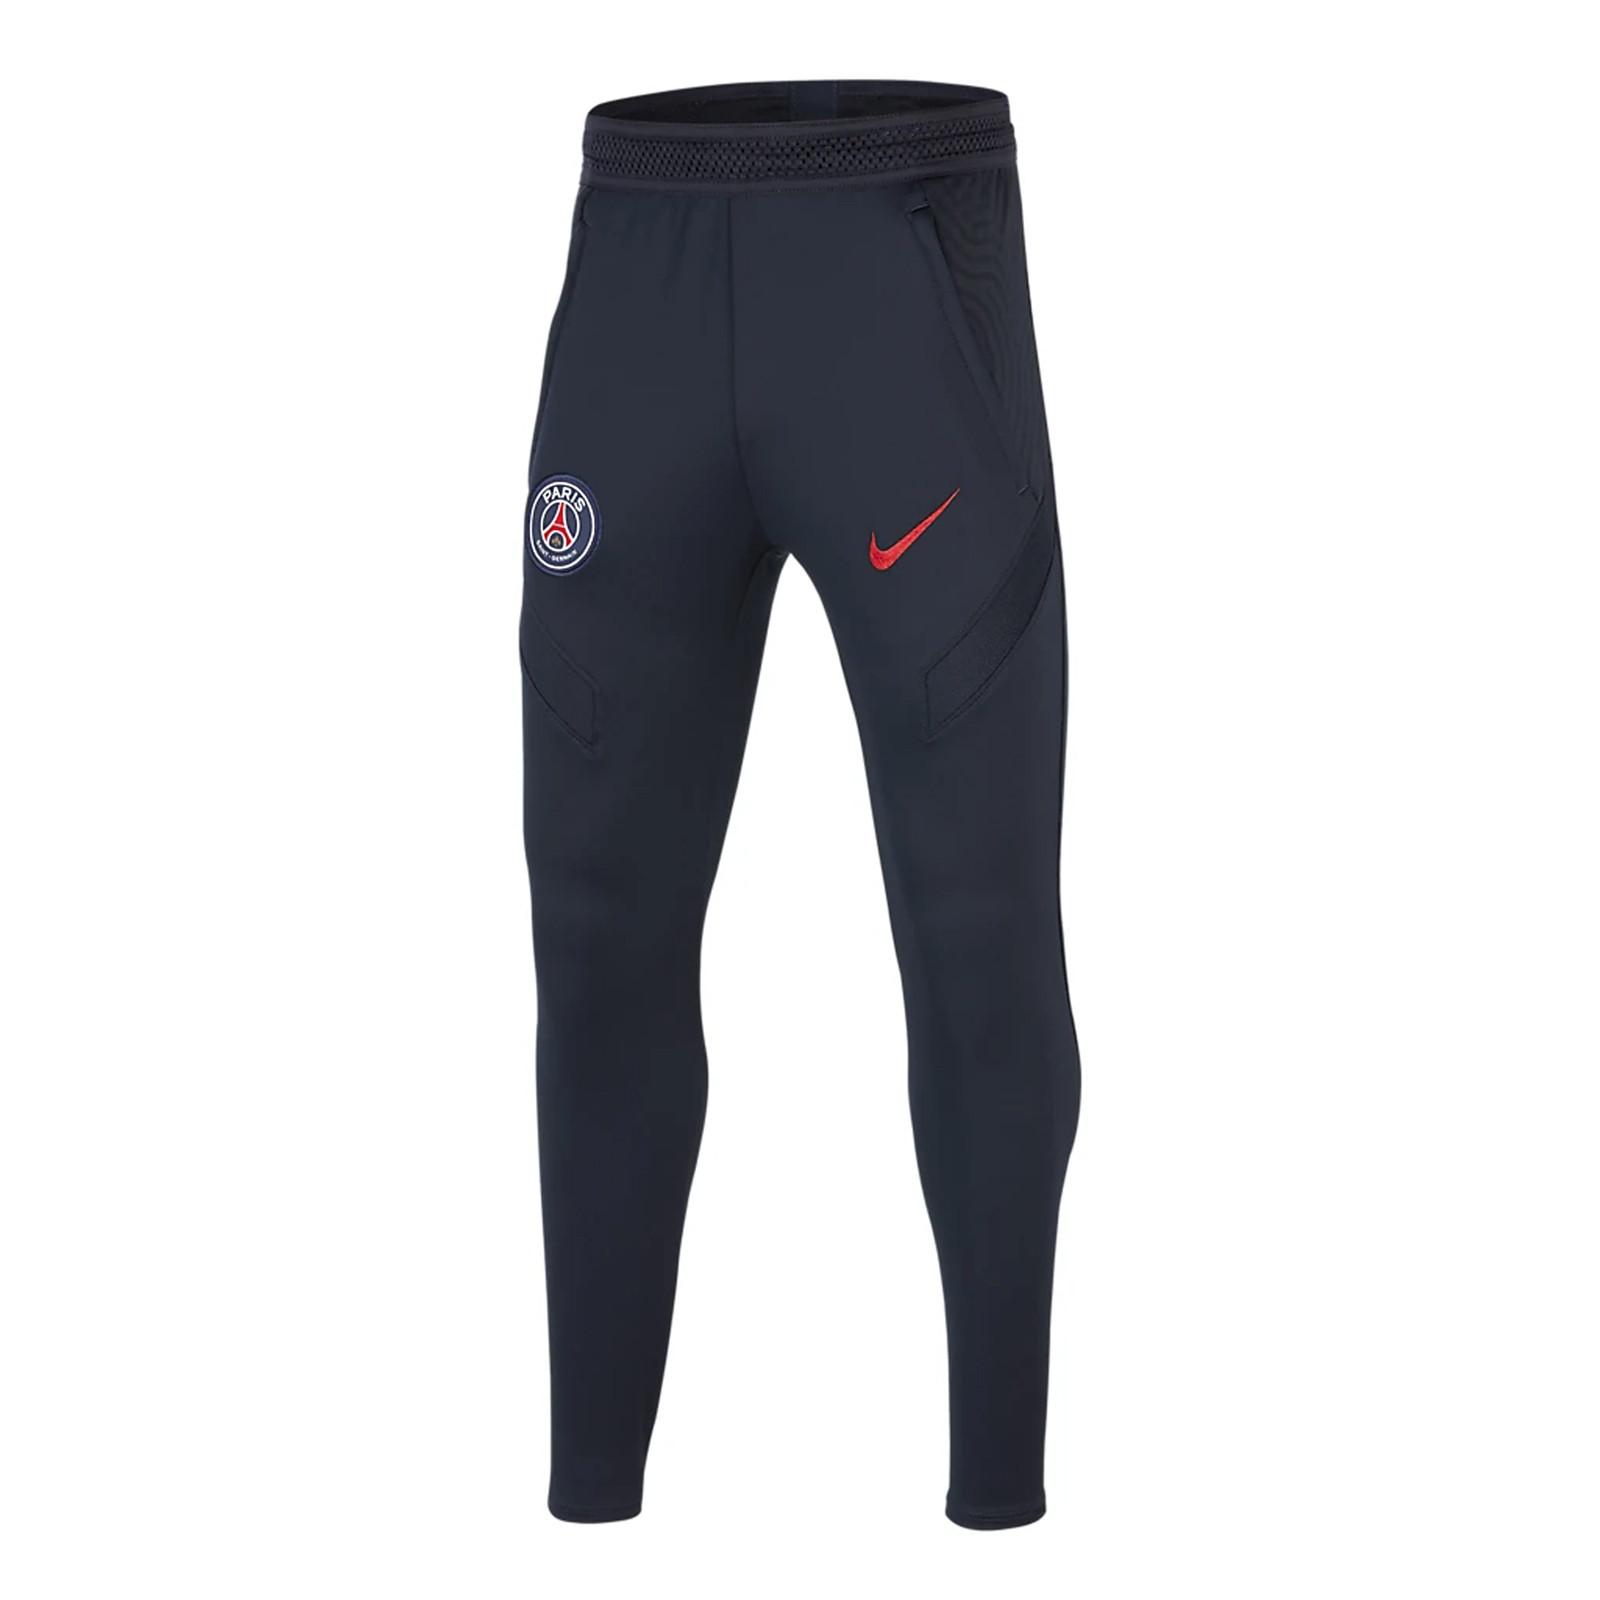 Pantalon Nike Psg Nino Entreno 2020 2021 Strike Futbolmaniakids